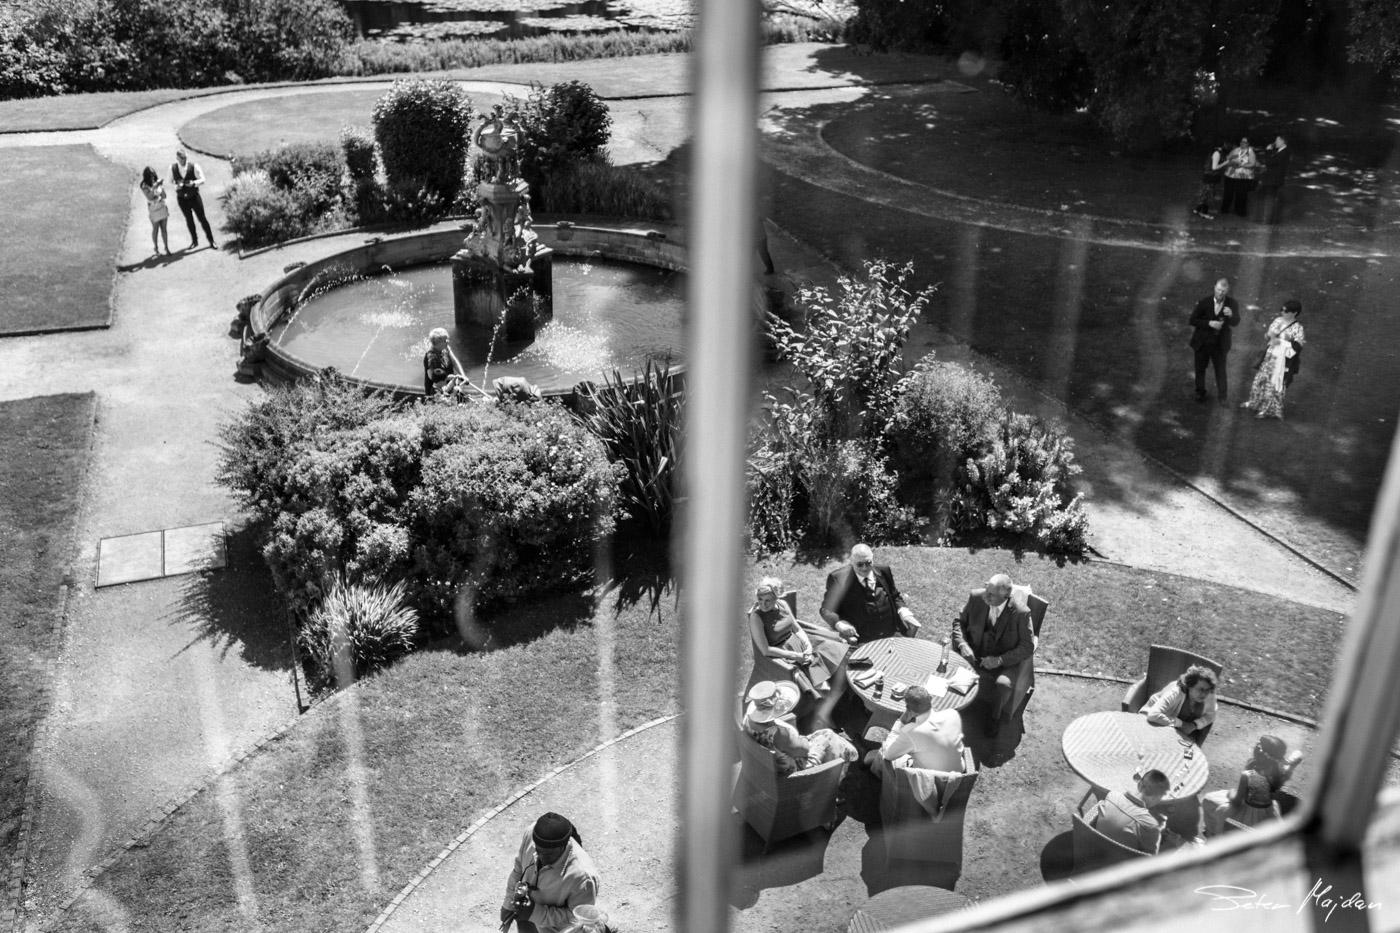 Colwick-hall-wedding-photography-30.jpg